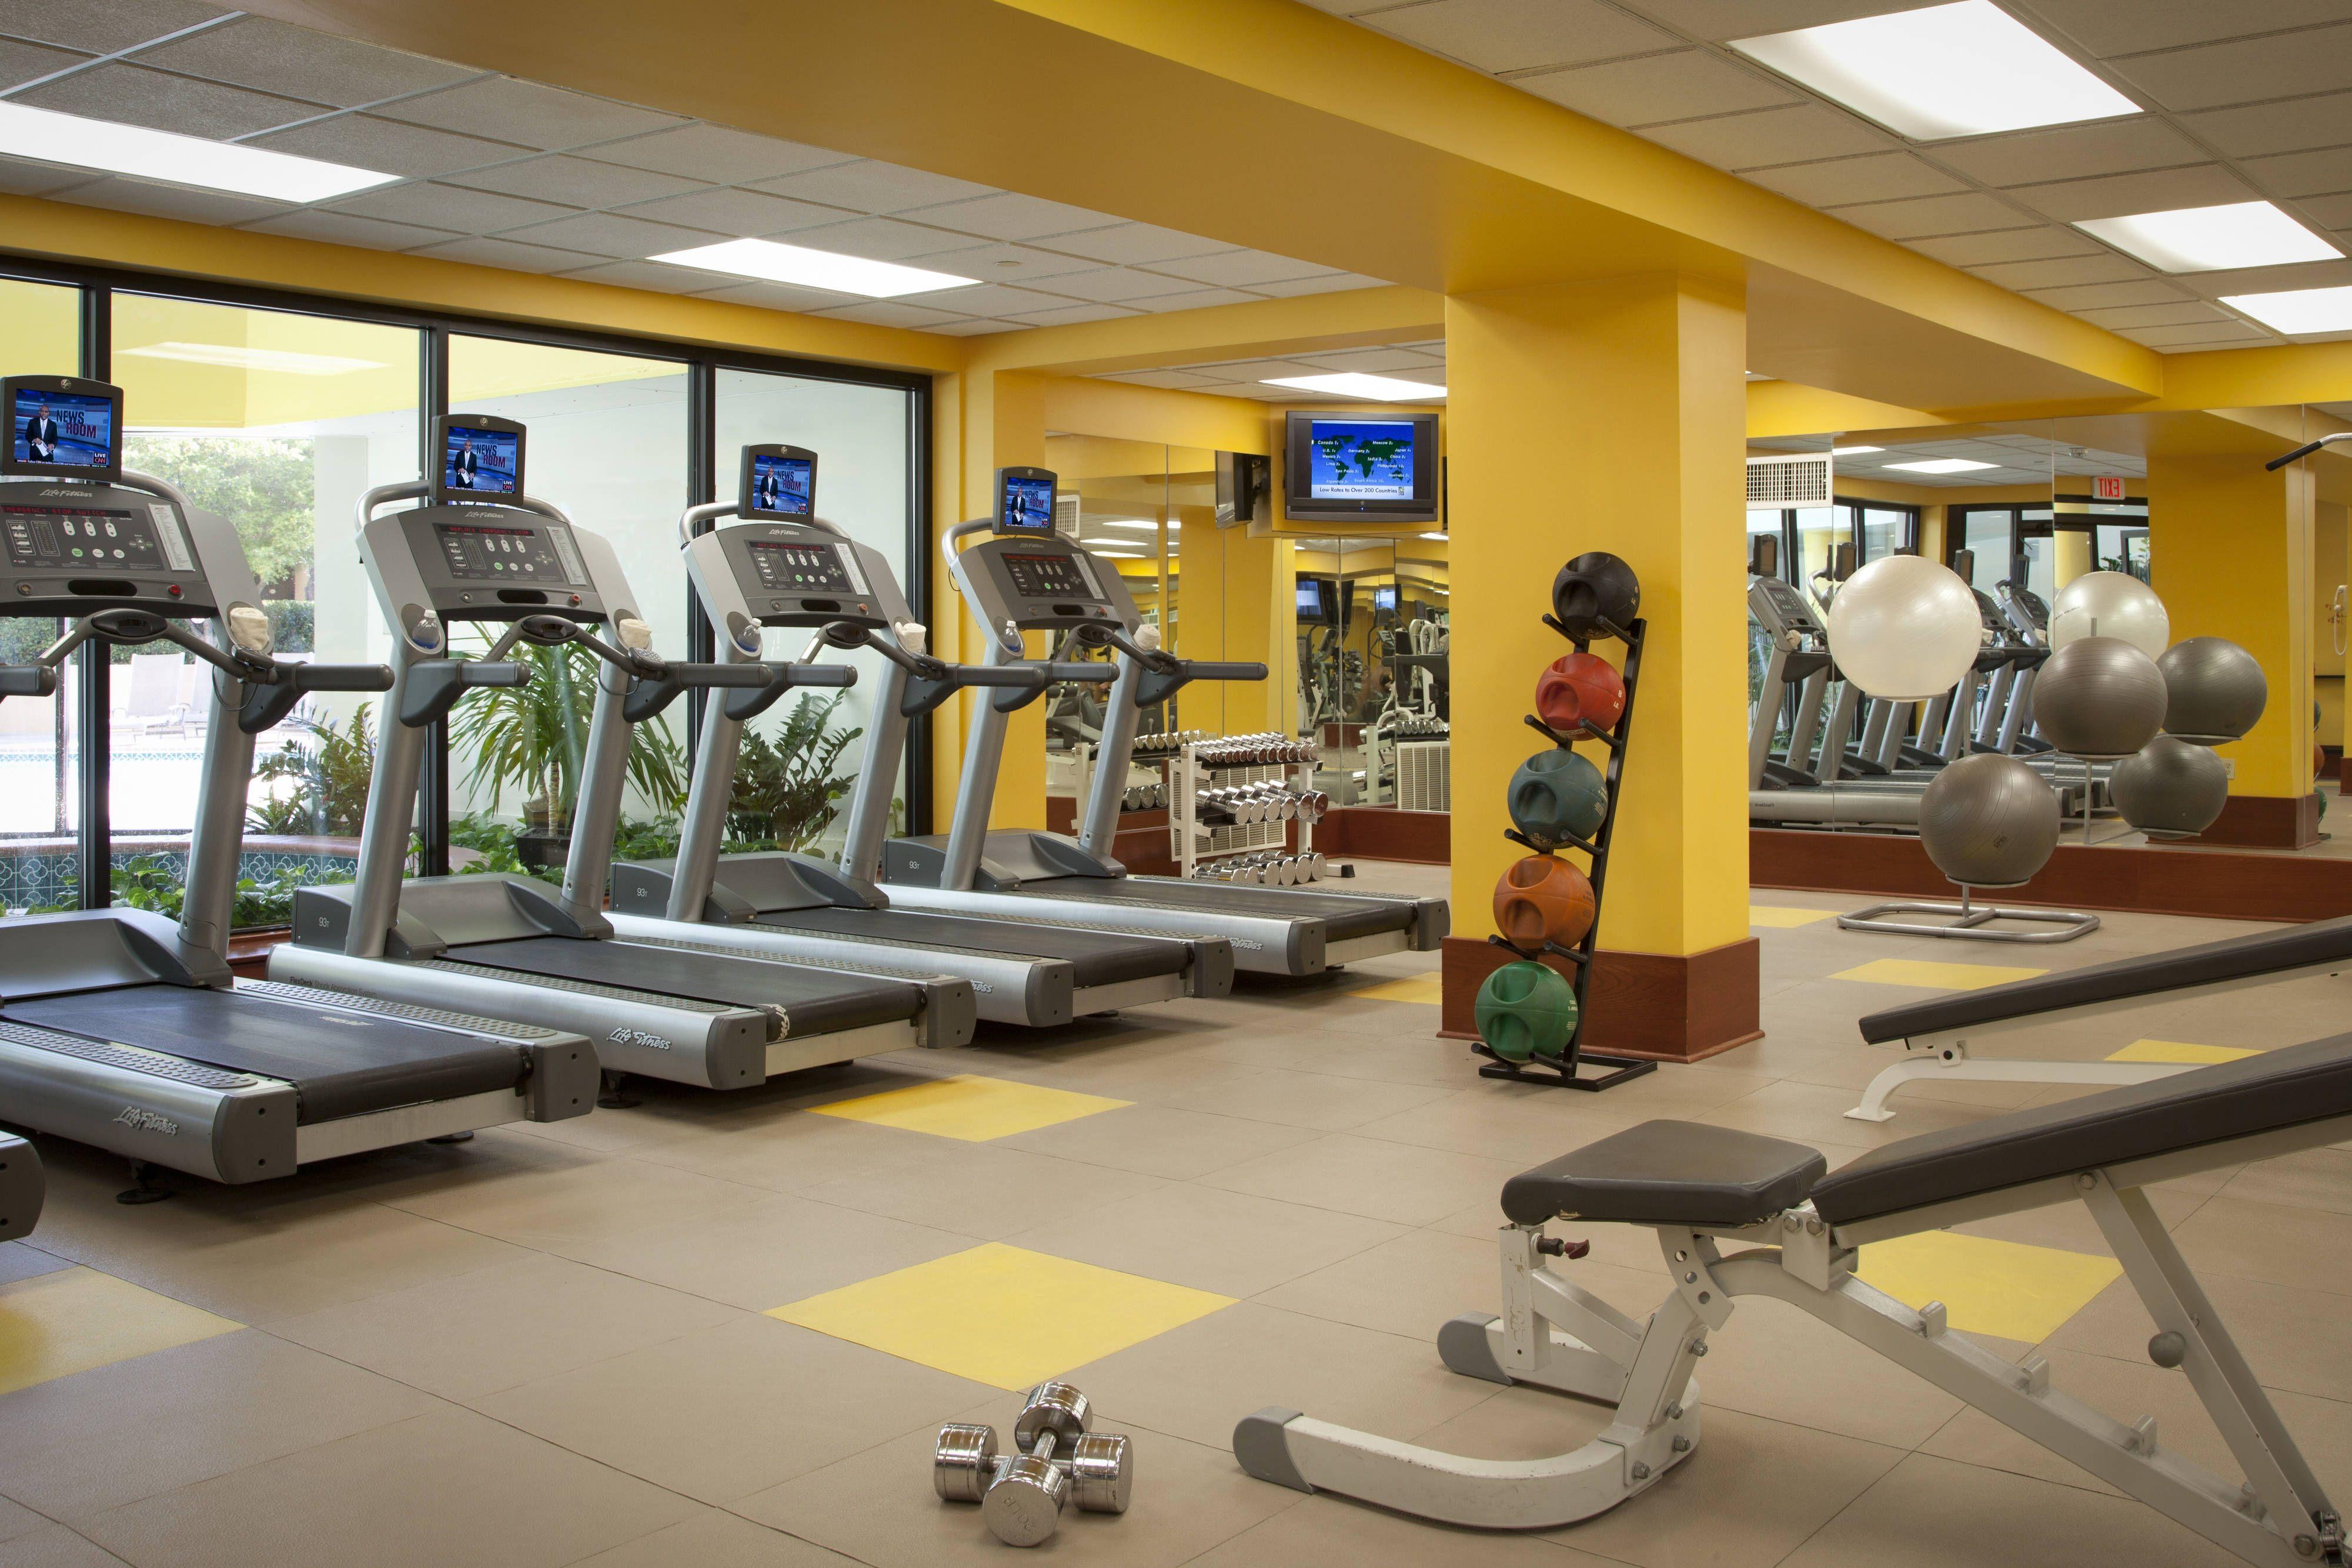 Dallas Fort Worth Airport Marriott Fitness Center Guestroom Hotels Guest Dallas Fort Worth Fort Worth Hotel